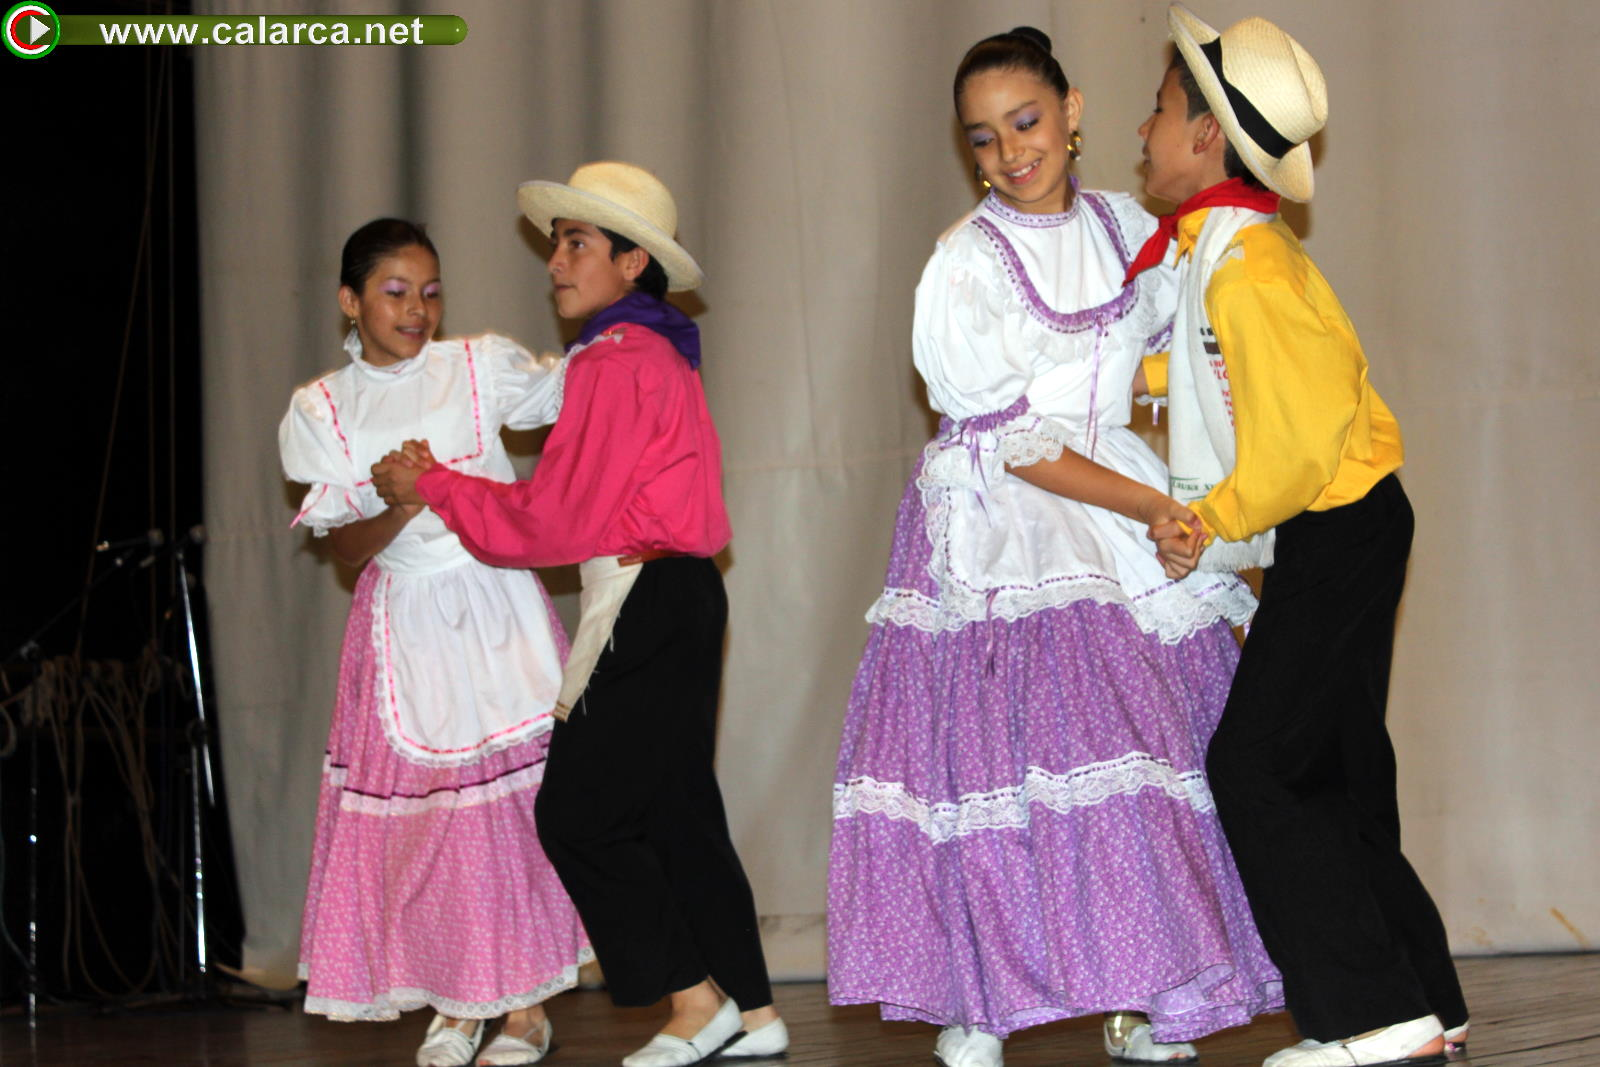 Danza folclórica - John F. Kennedy